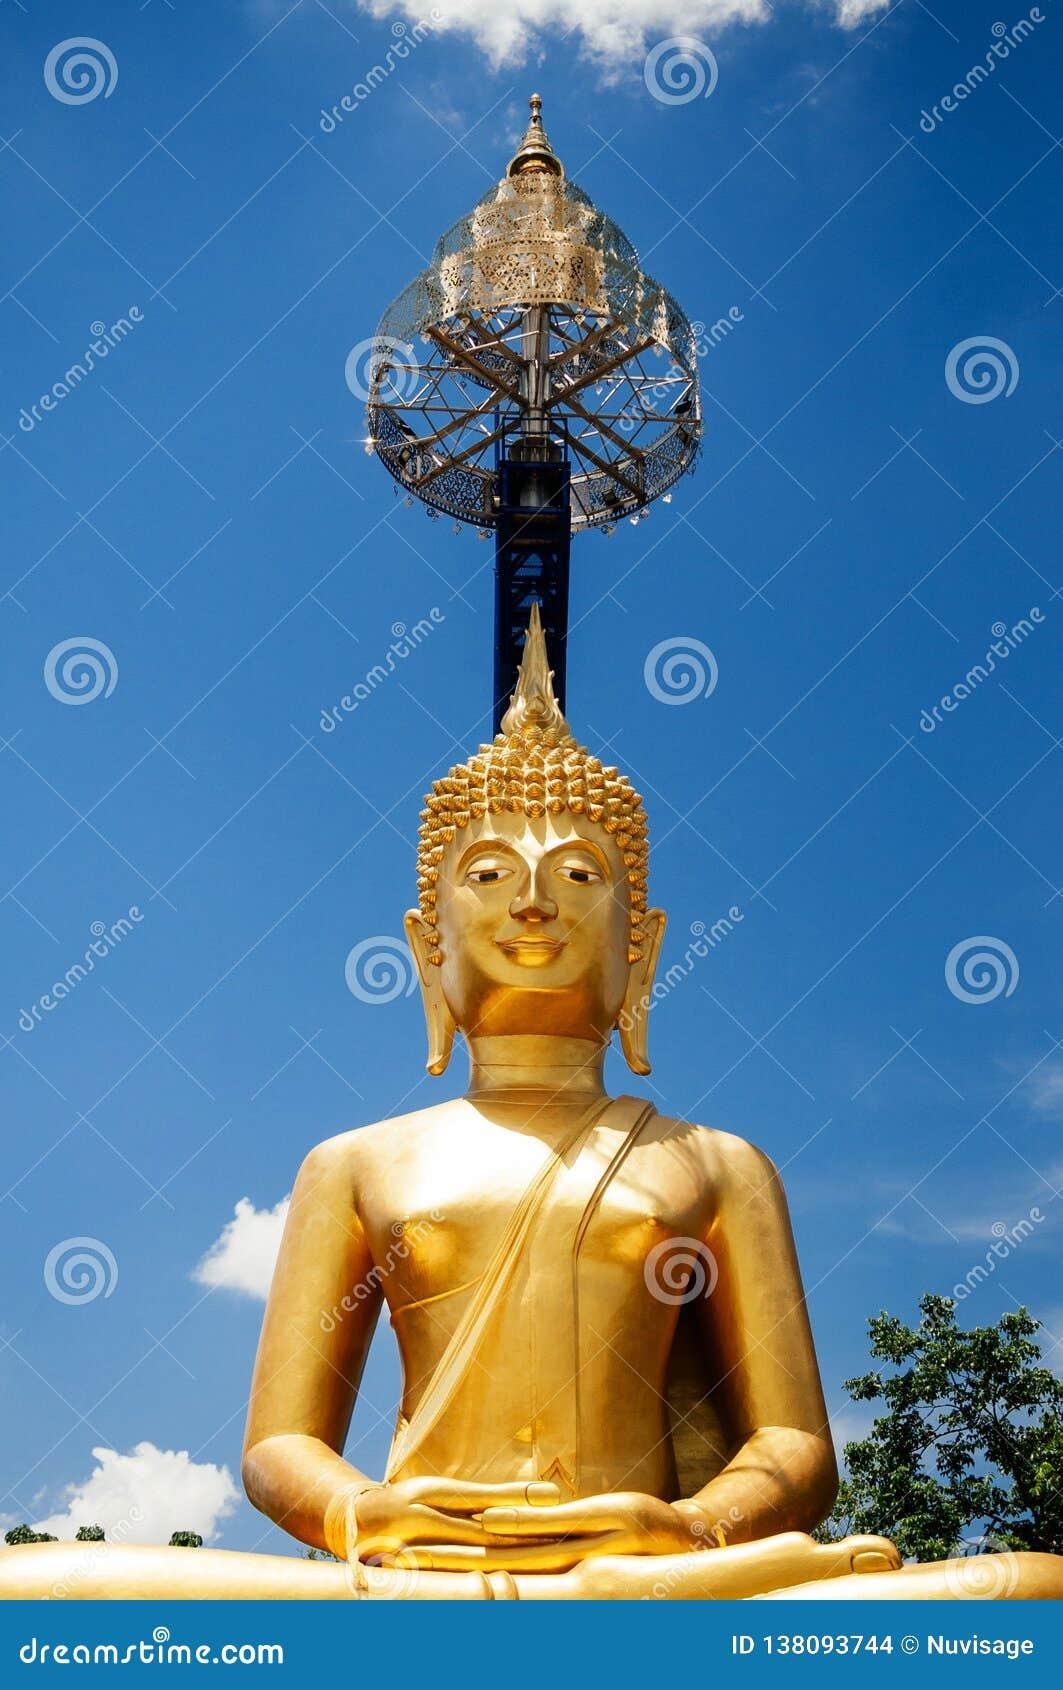 Goldene Buddha-Statue von Khao Kradong, Buriram - Thailand